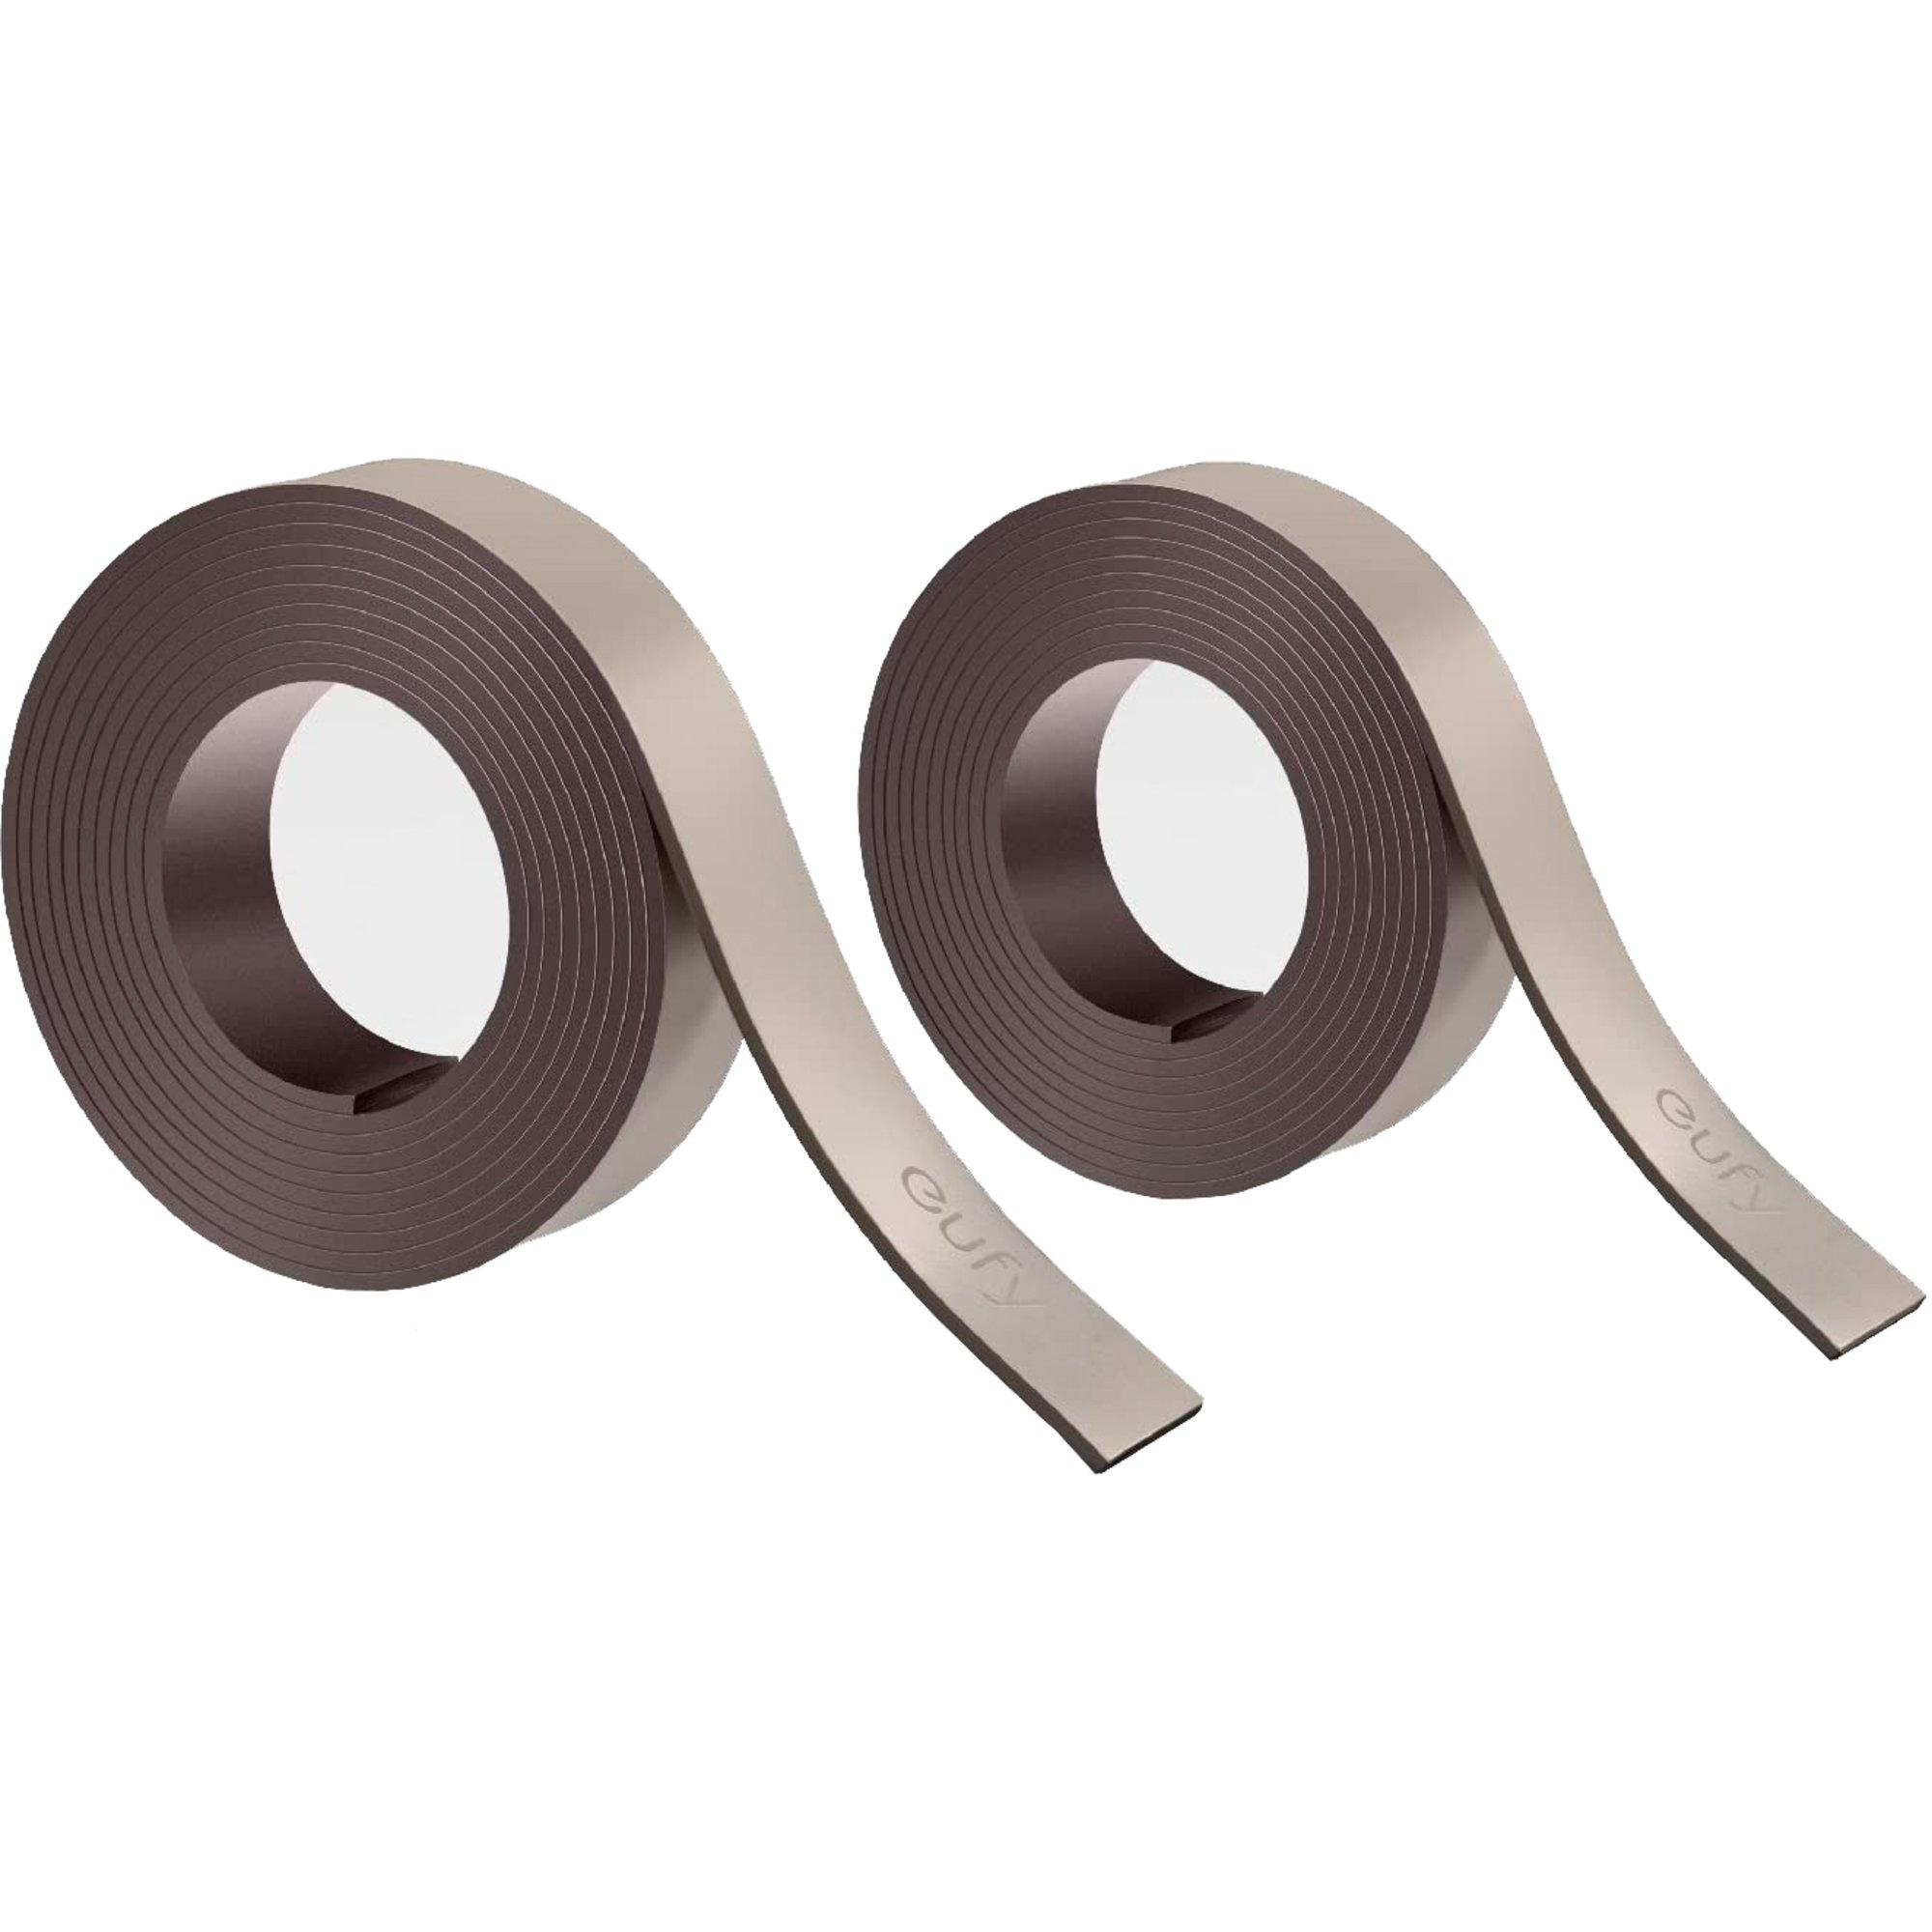 Eufy RoboVac 35C & L70 magnetband